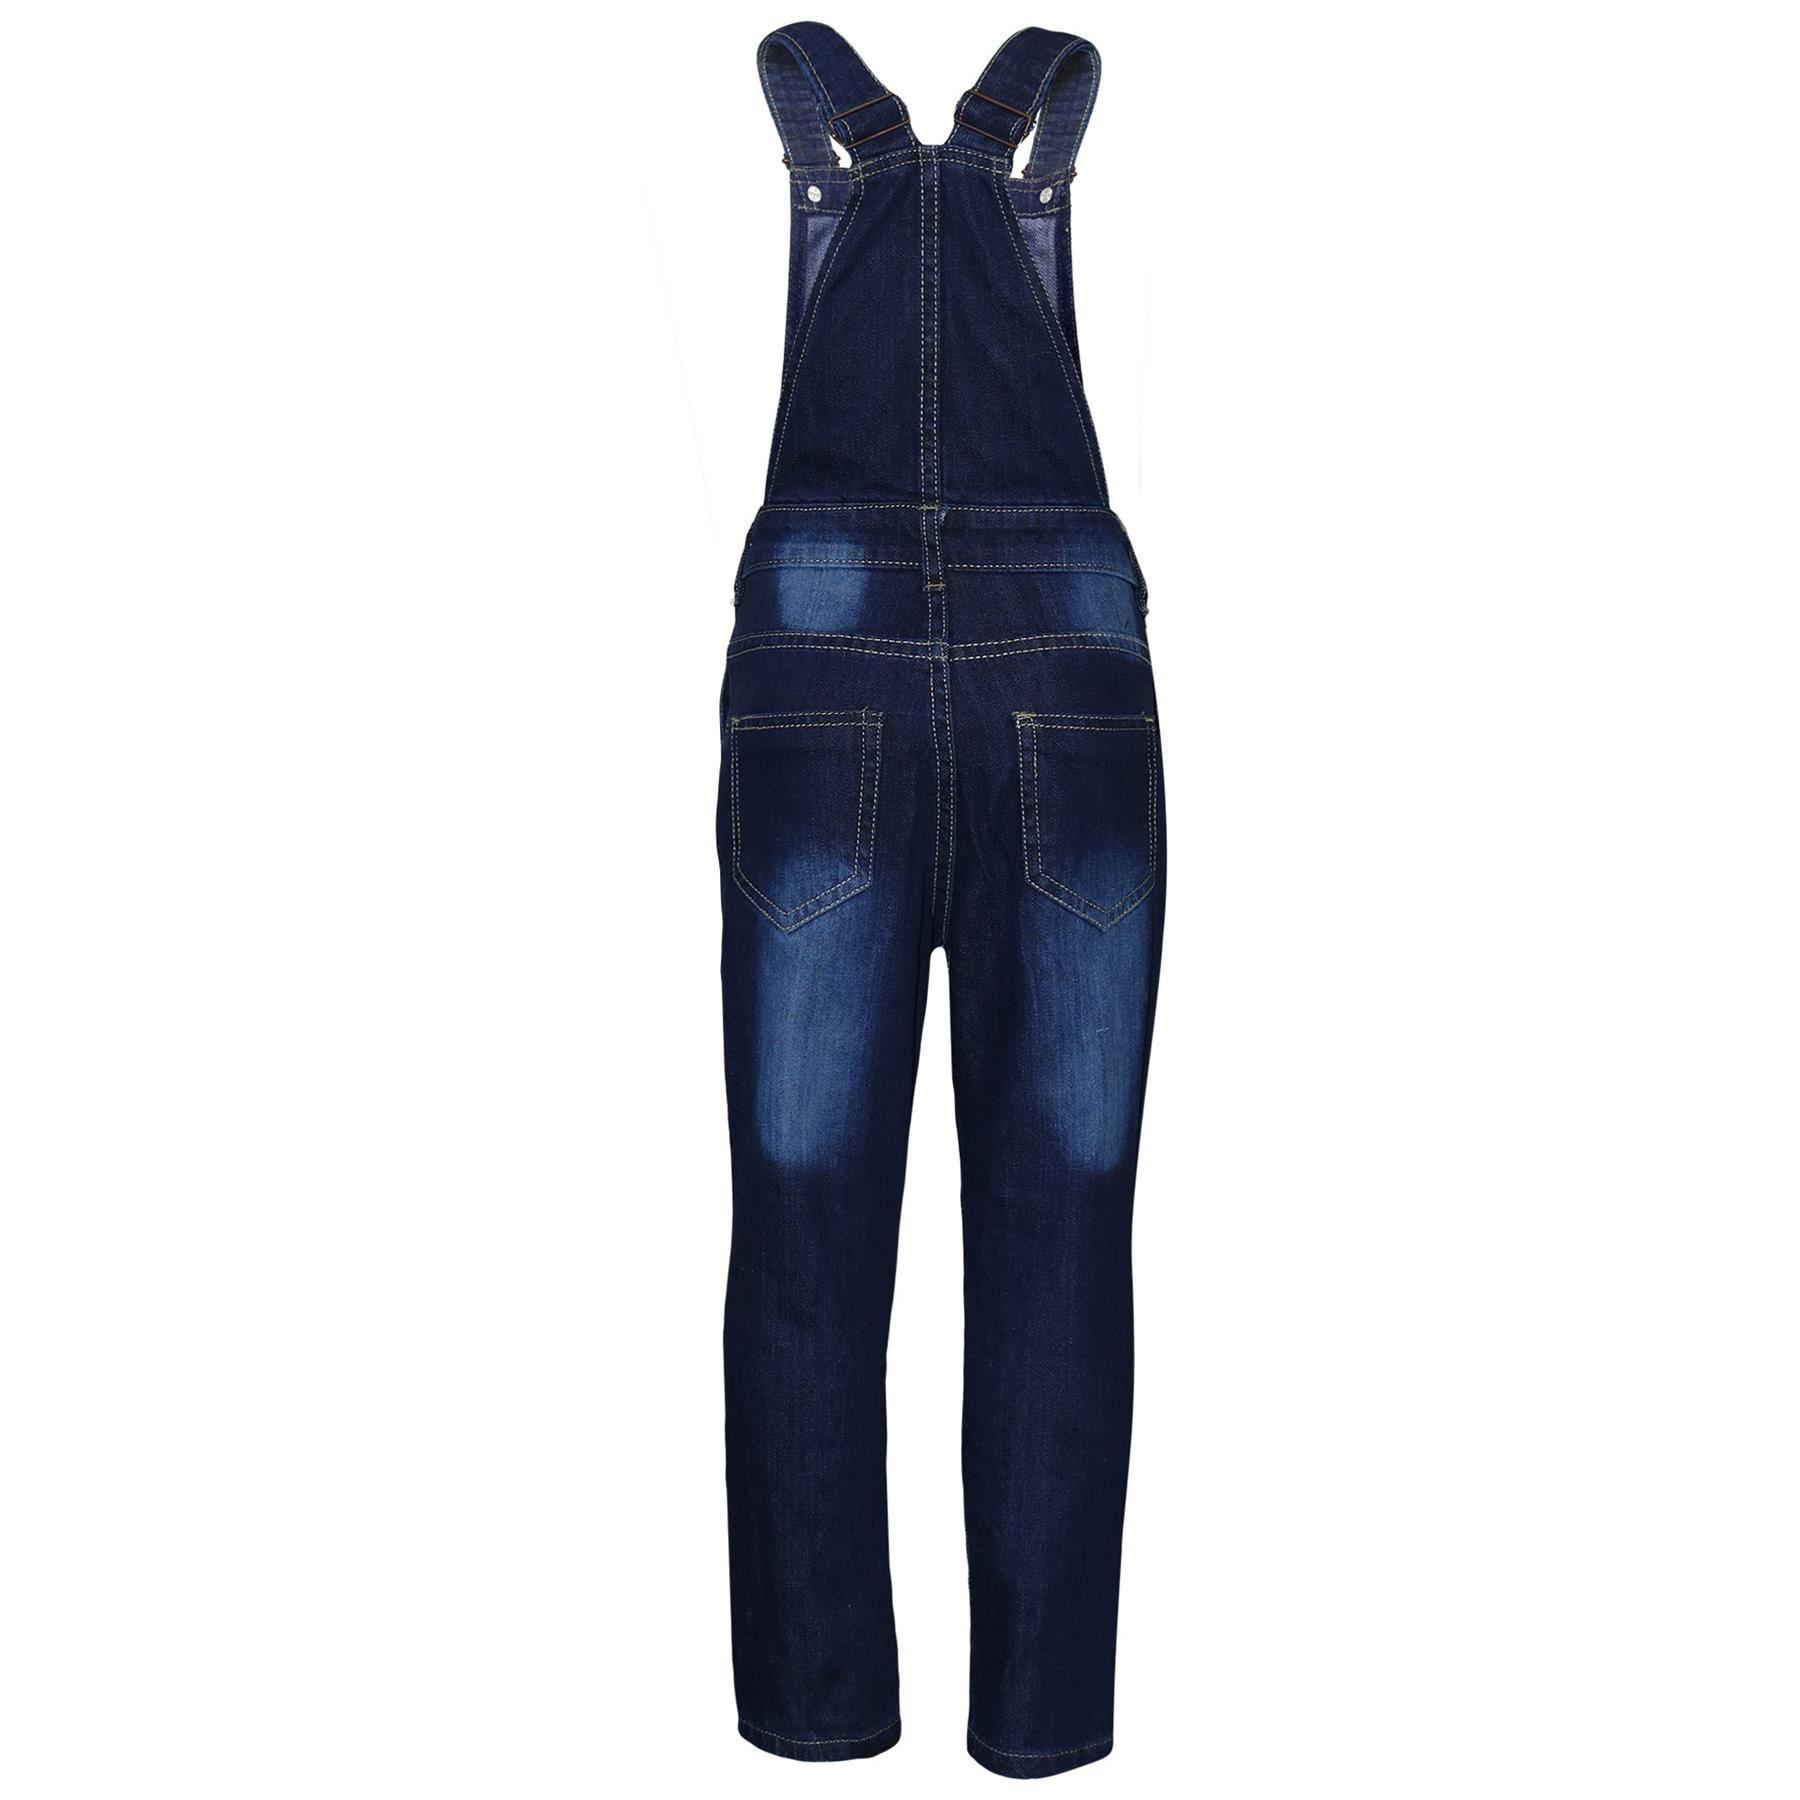 Indexbild 3 - Kinder Mädchen Denim Latzhose Zerrissen Dunkelblau Jeans Overall Mode 5-1